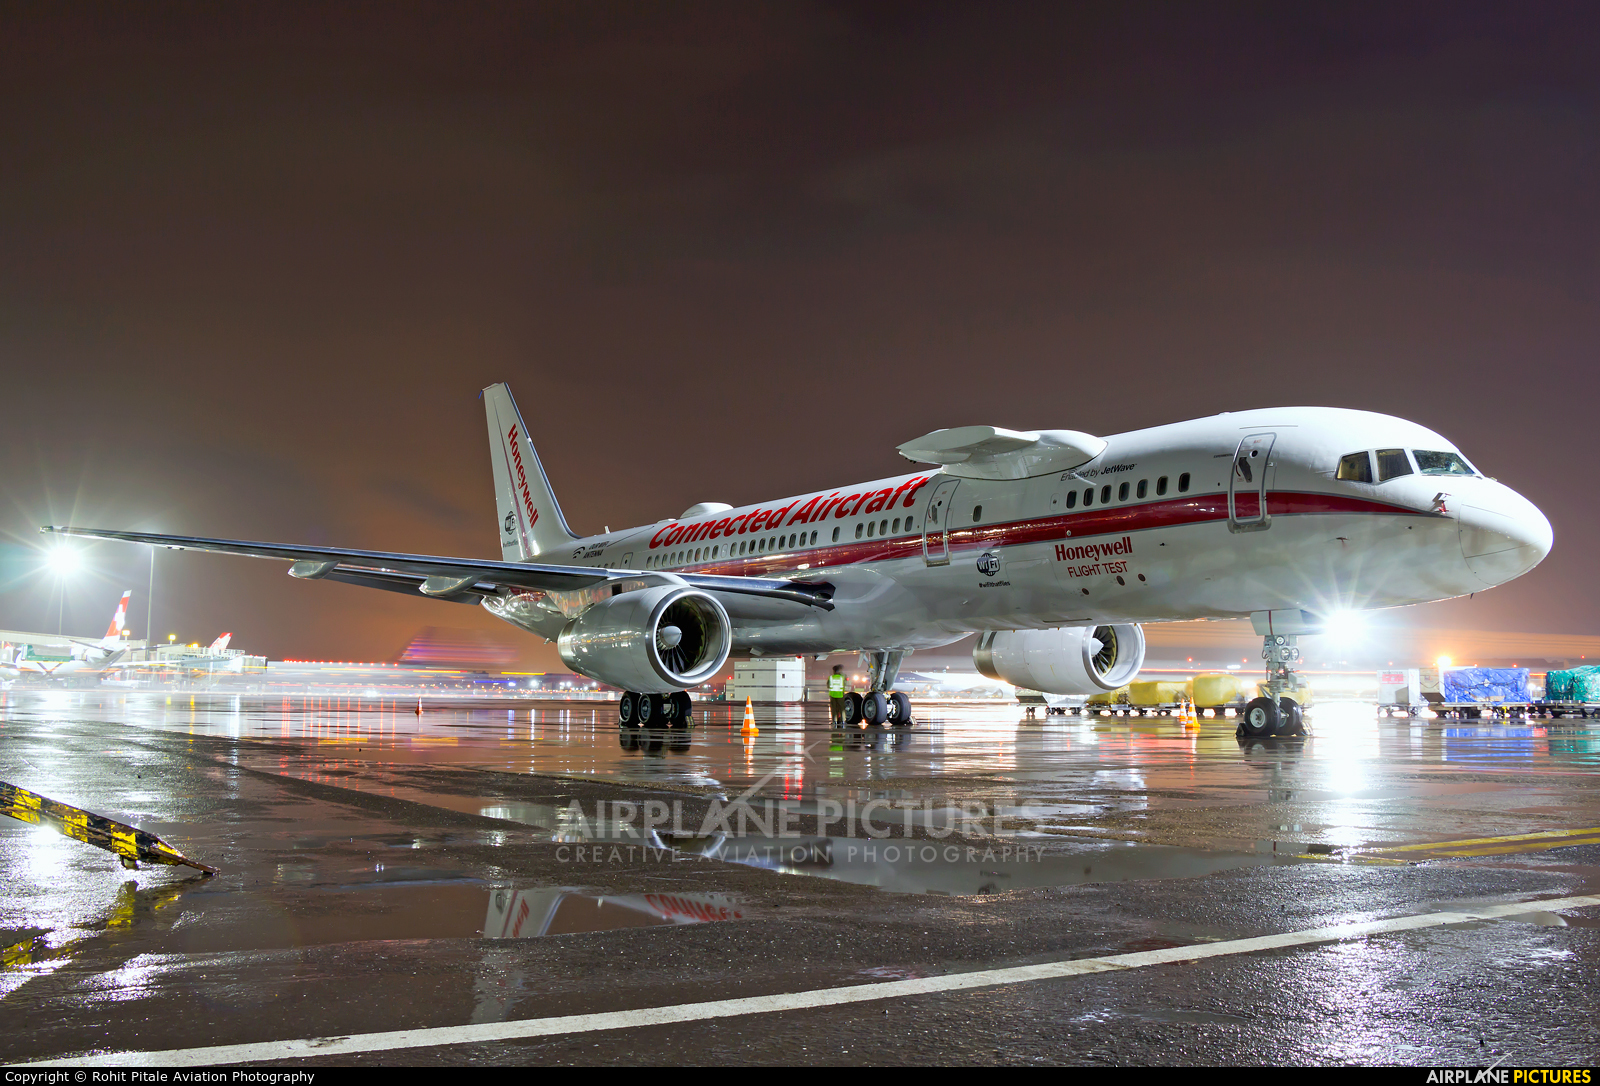 Honeywell Aviation Services N757HW aircraft at Mumbai - Chhatrapati Shivaji Intl